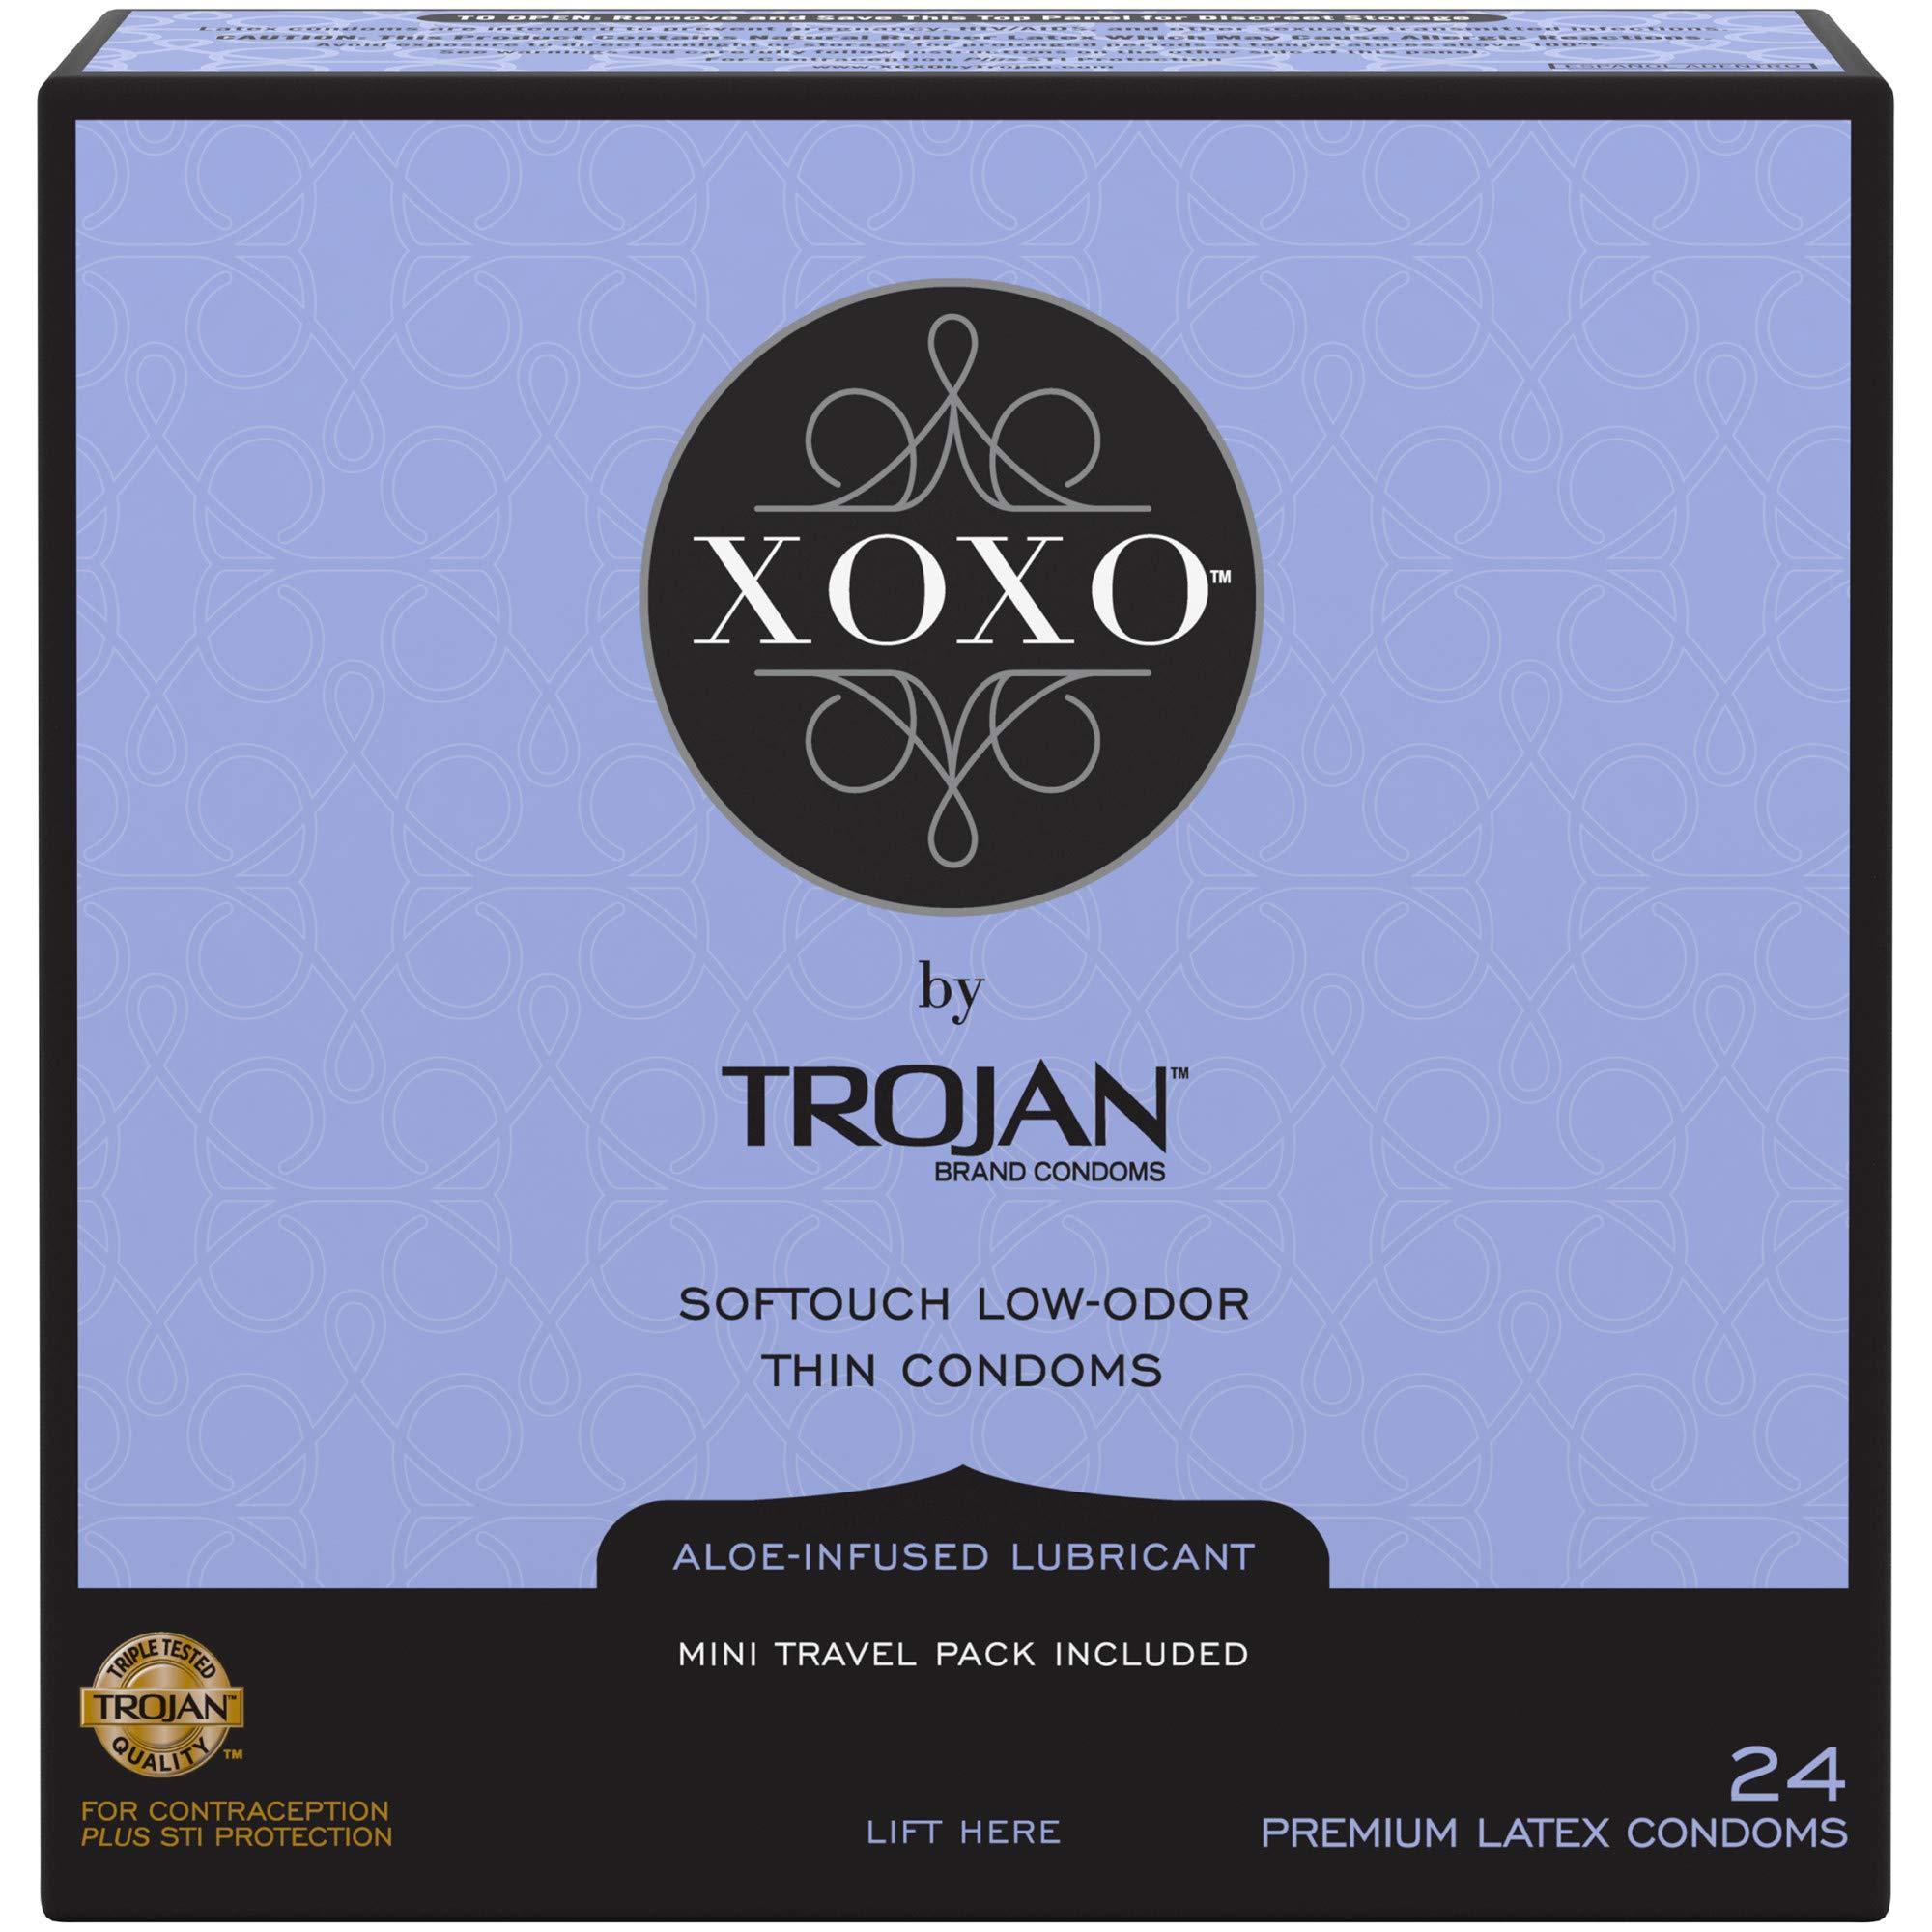 Trojan XOXO Thin Softouch Lubricated Latex Condoms, 24ct by TROJAN